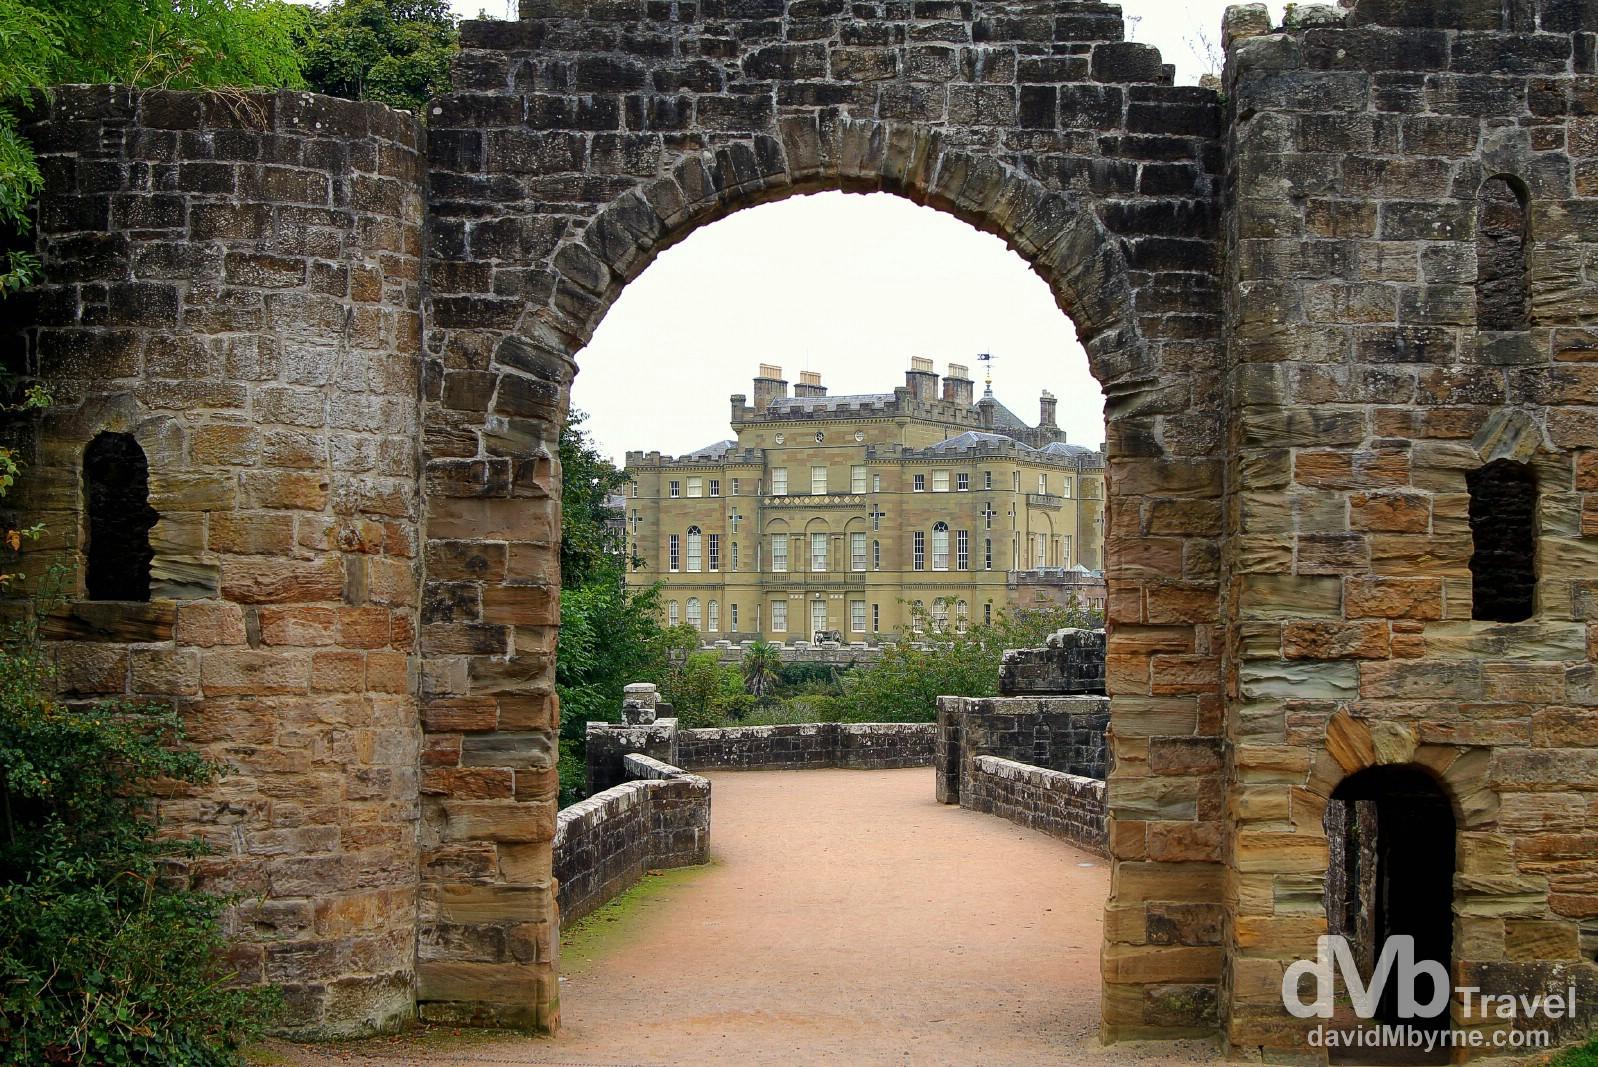 Culzean Castle, Ayrshire, Scotland. September 19, 2014.